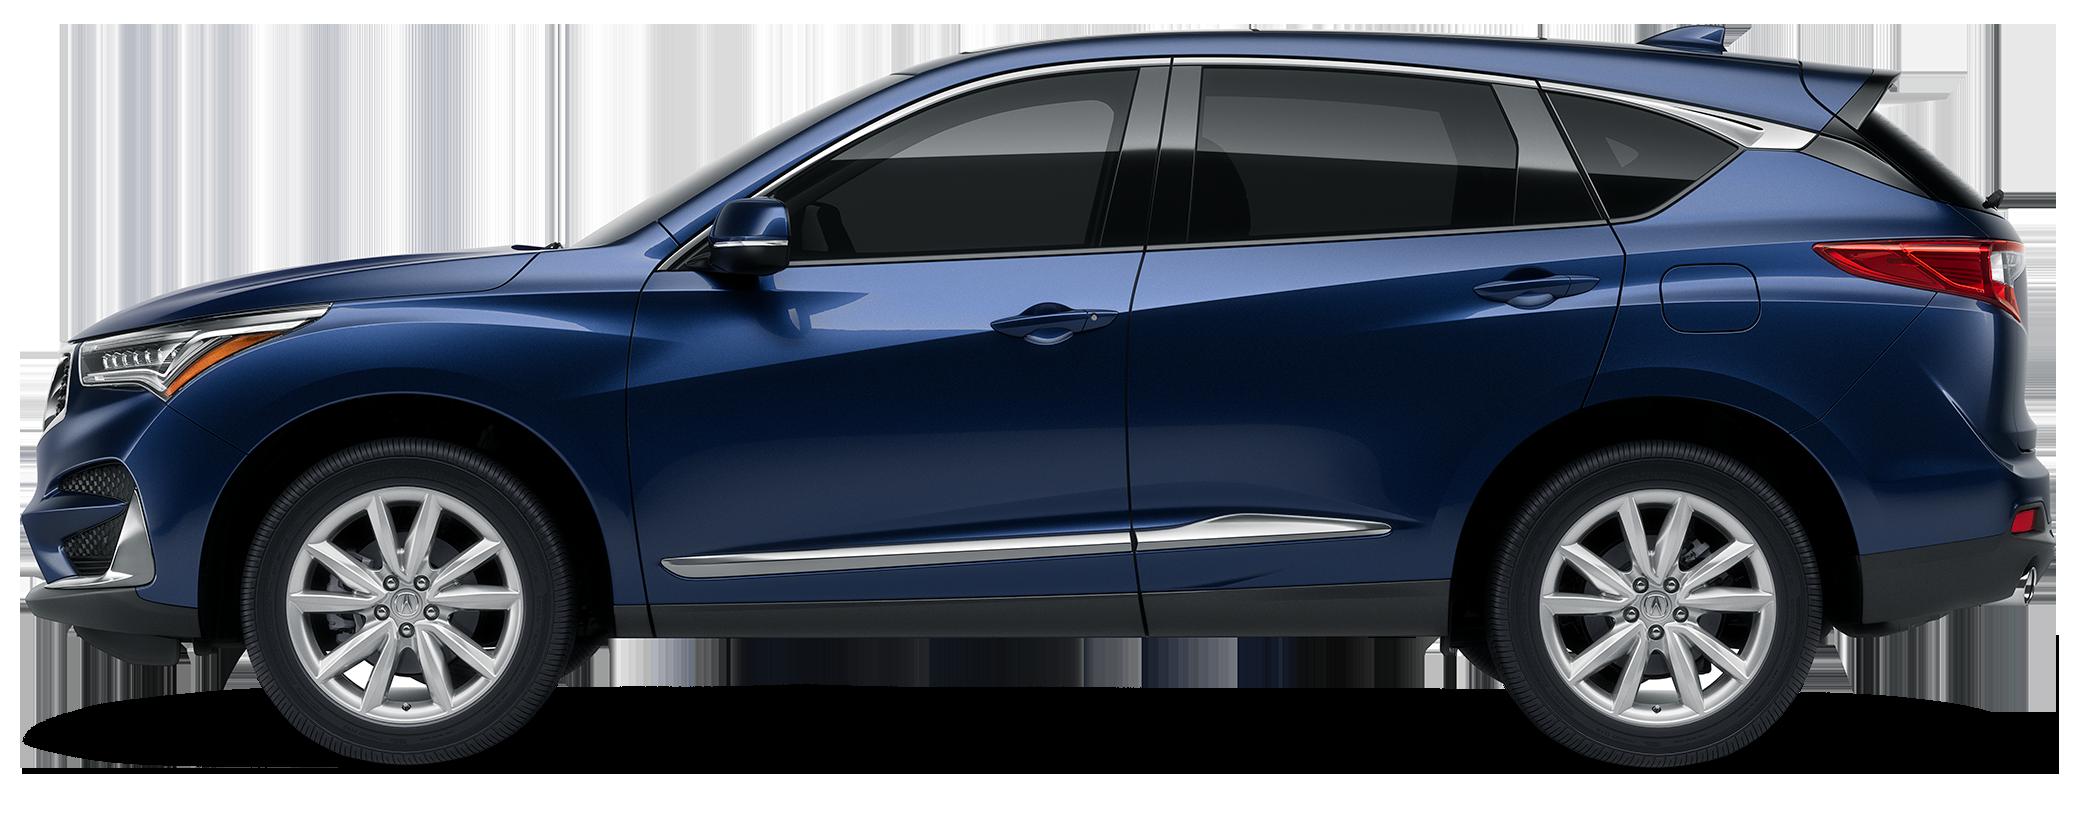 2021 Acura RDX SUV Tech